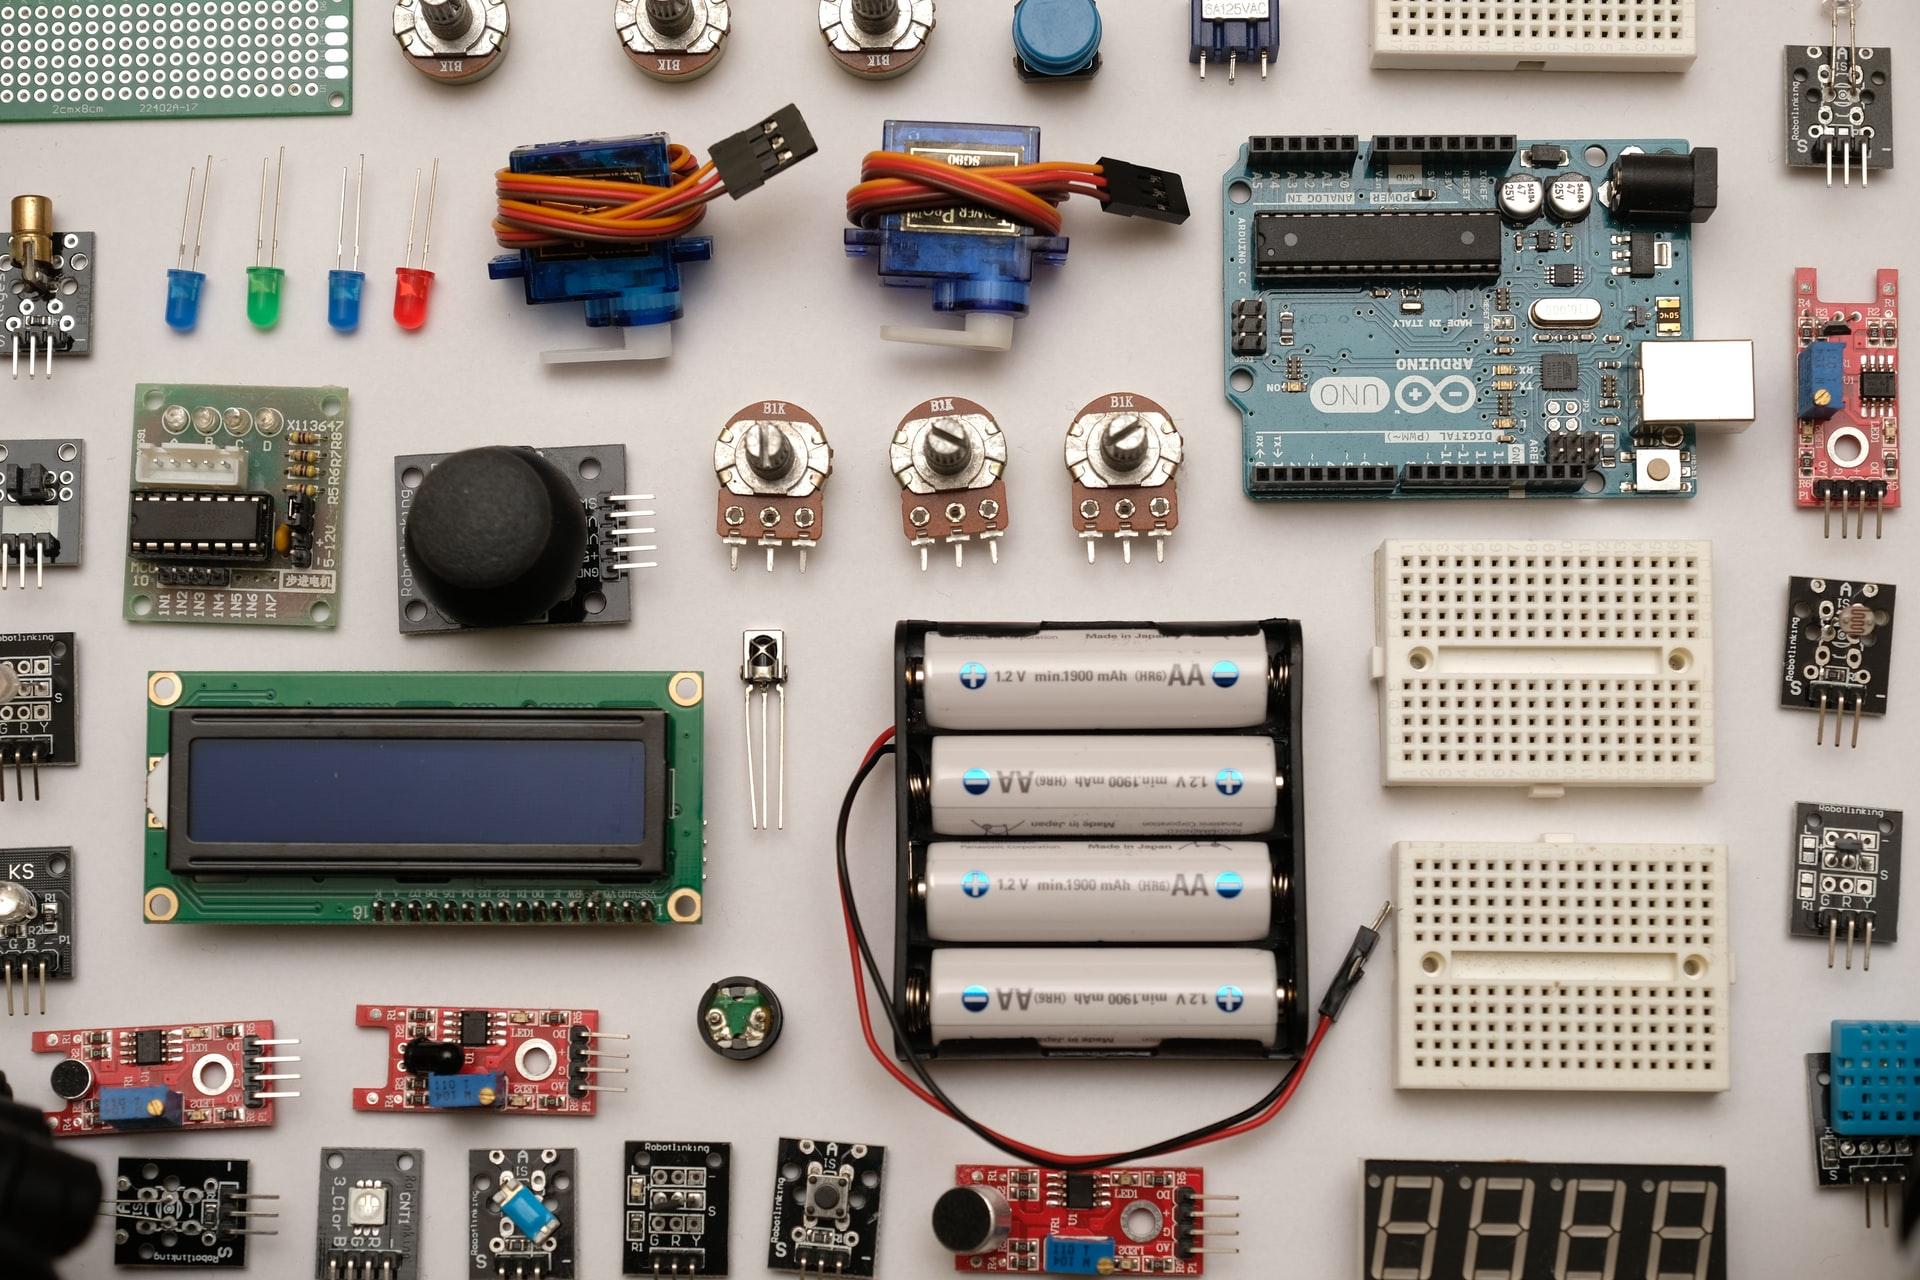 technologiai innovacio cementalapu akkumulator kornyezetvedelem